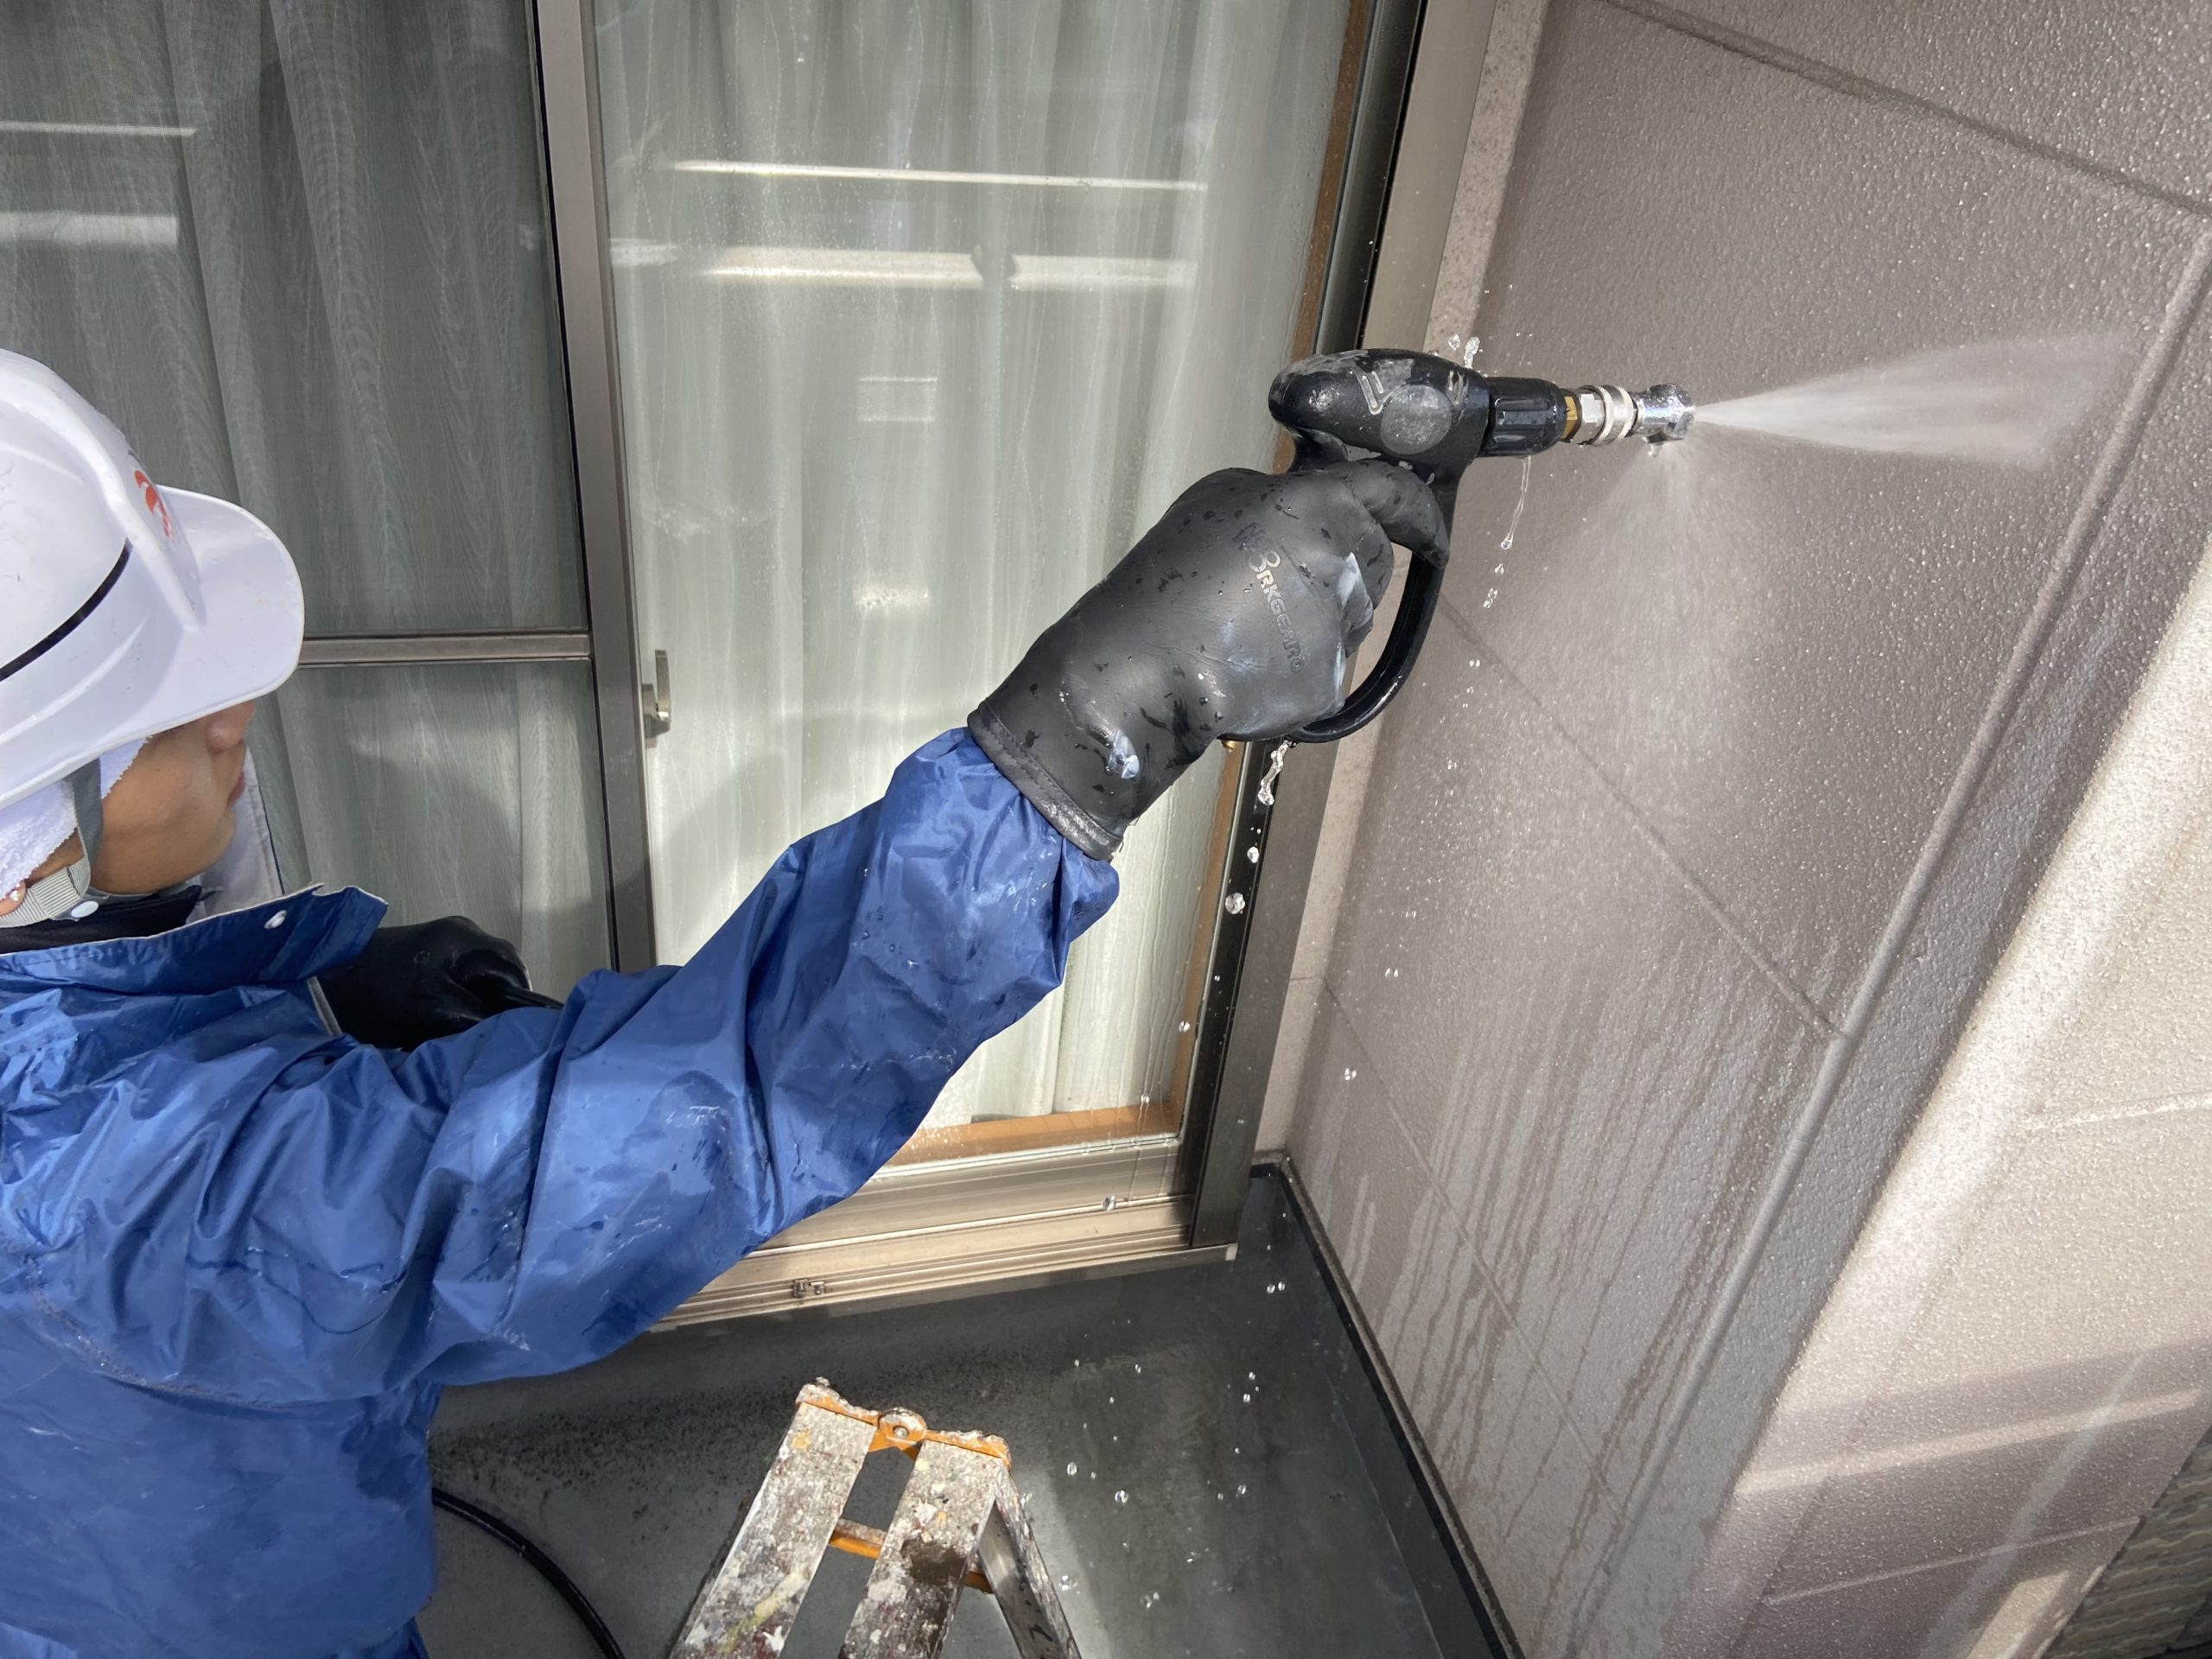 茨木・高槻の外壁屋根塗装防水YJリフォーム高圧洗浄@茨木市上泉町